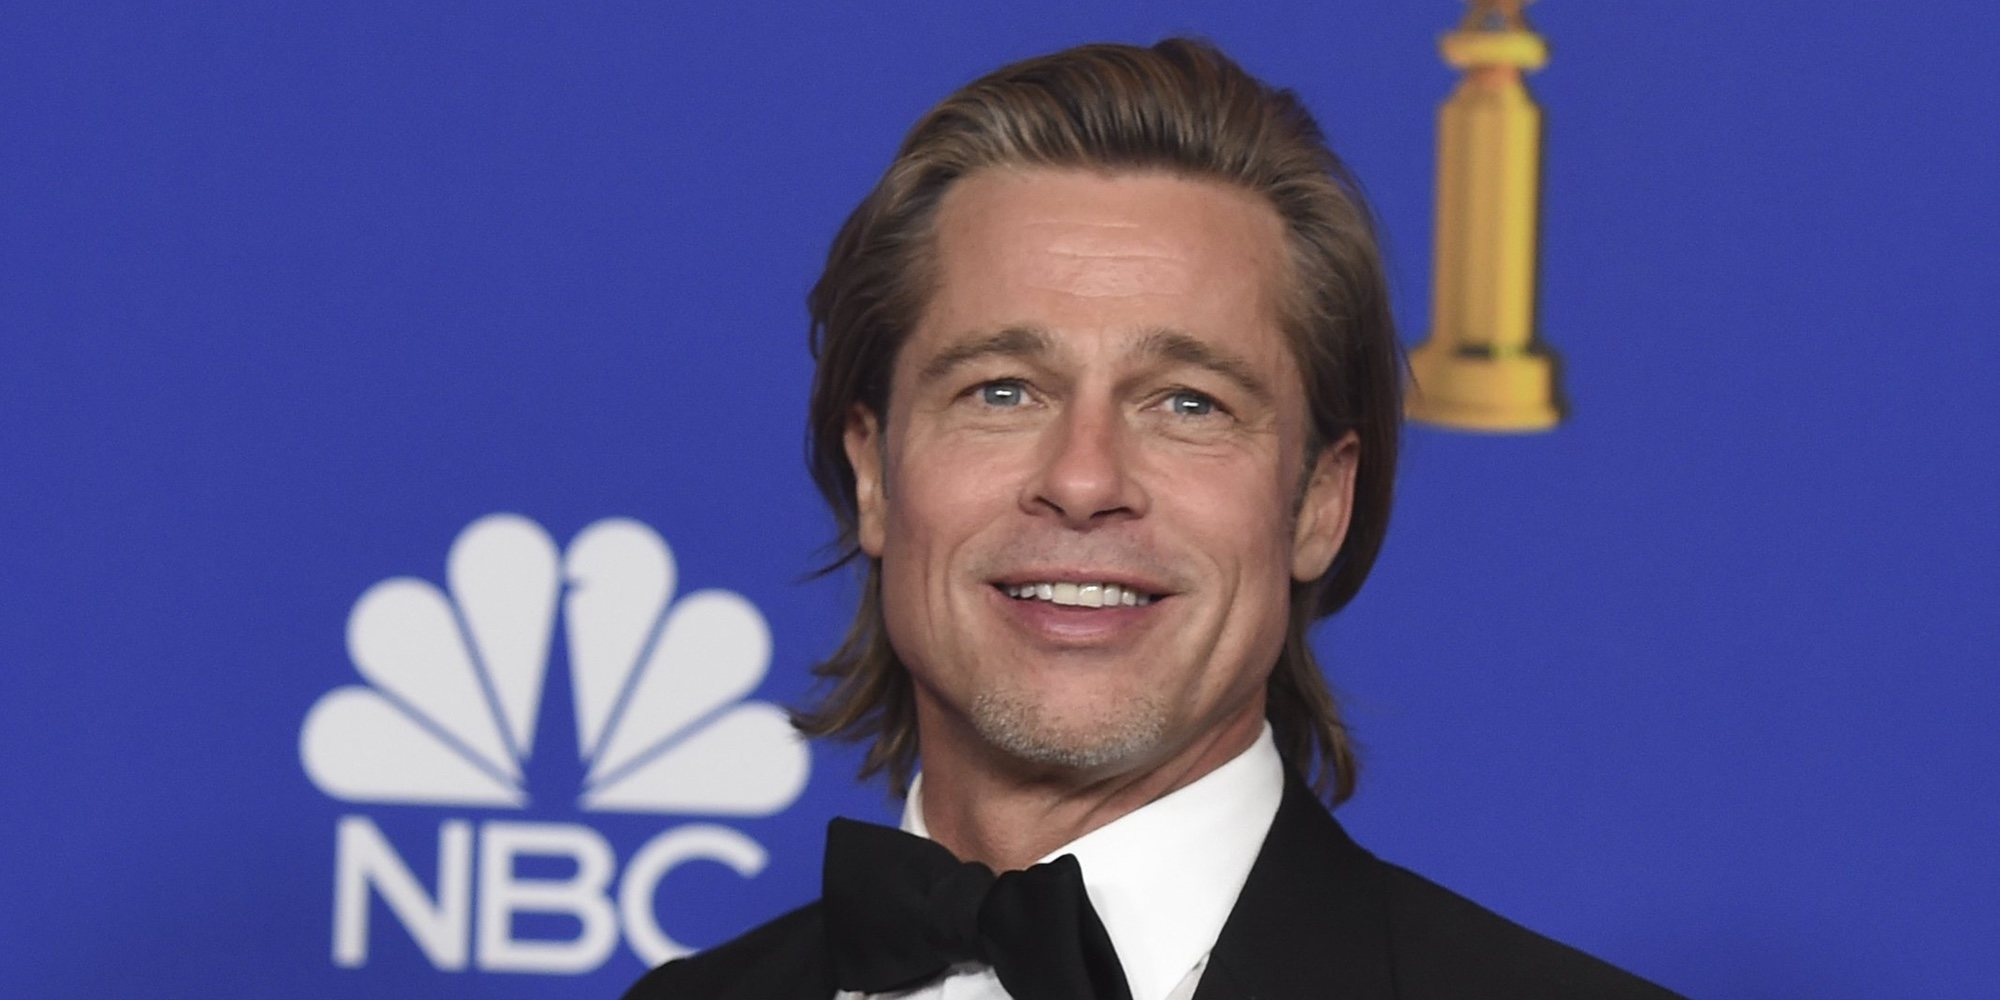 El motivo de la ausencia de Brad Pitt en los premios BAFTA 2020